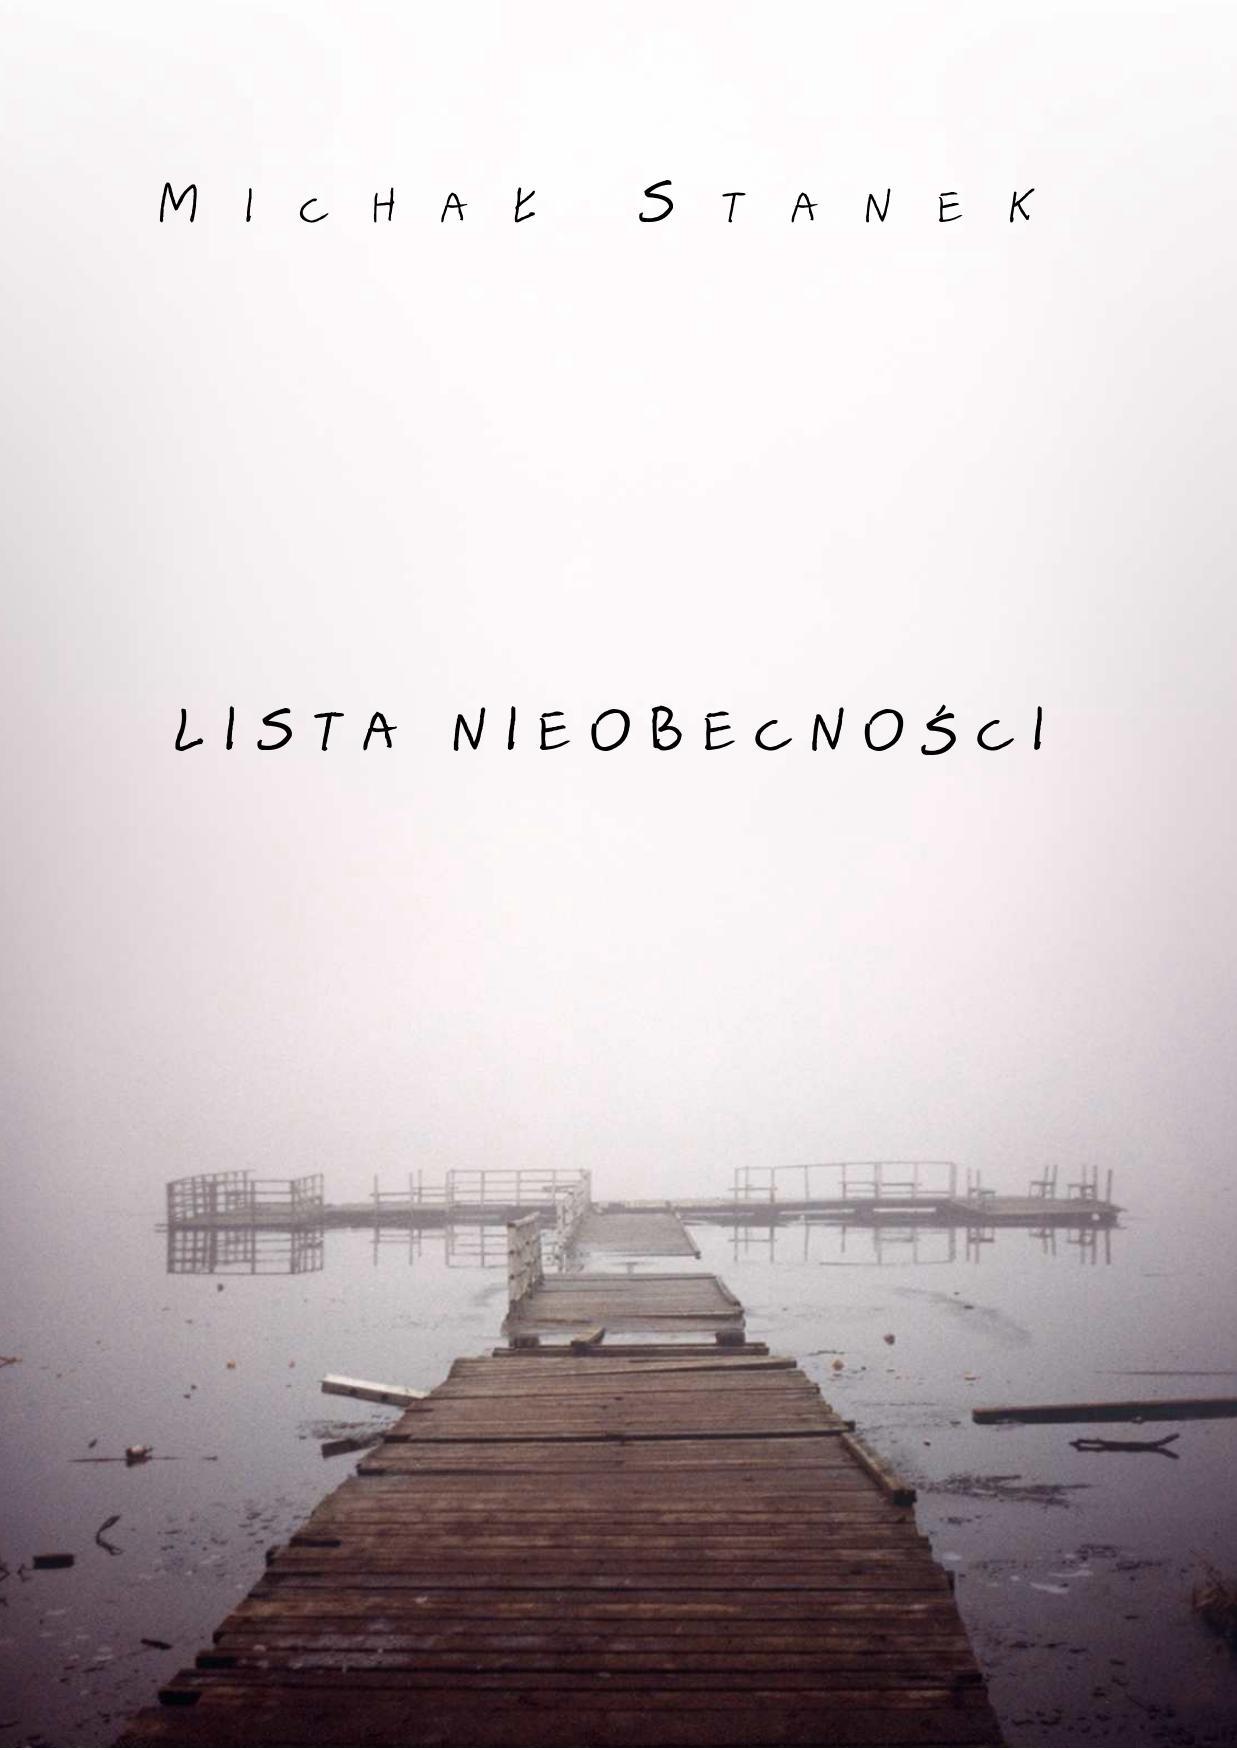 http://hl.wbp.lublin.pl/wbp/blog/Michal_Stanek_-_Lista_nieobecnosci.pdf